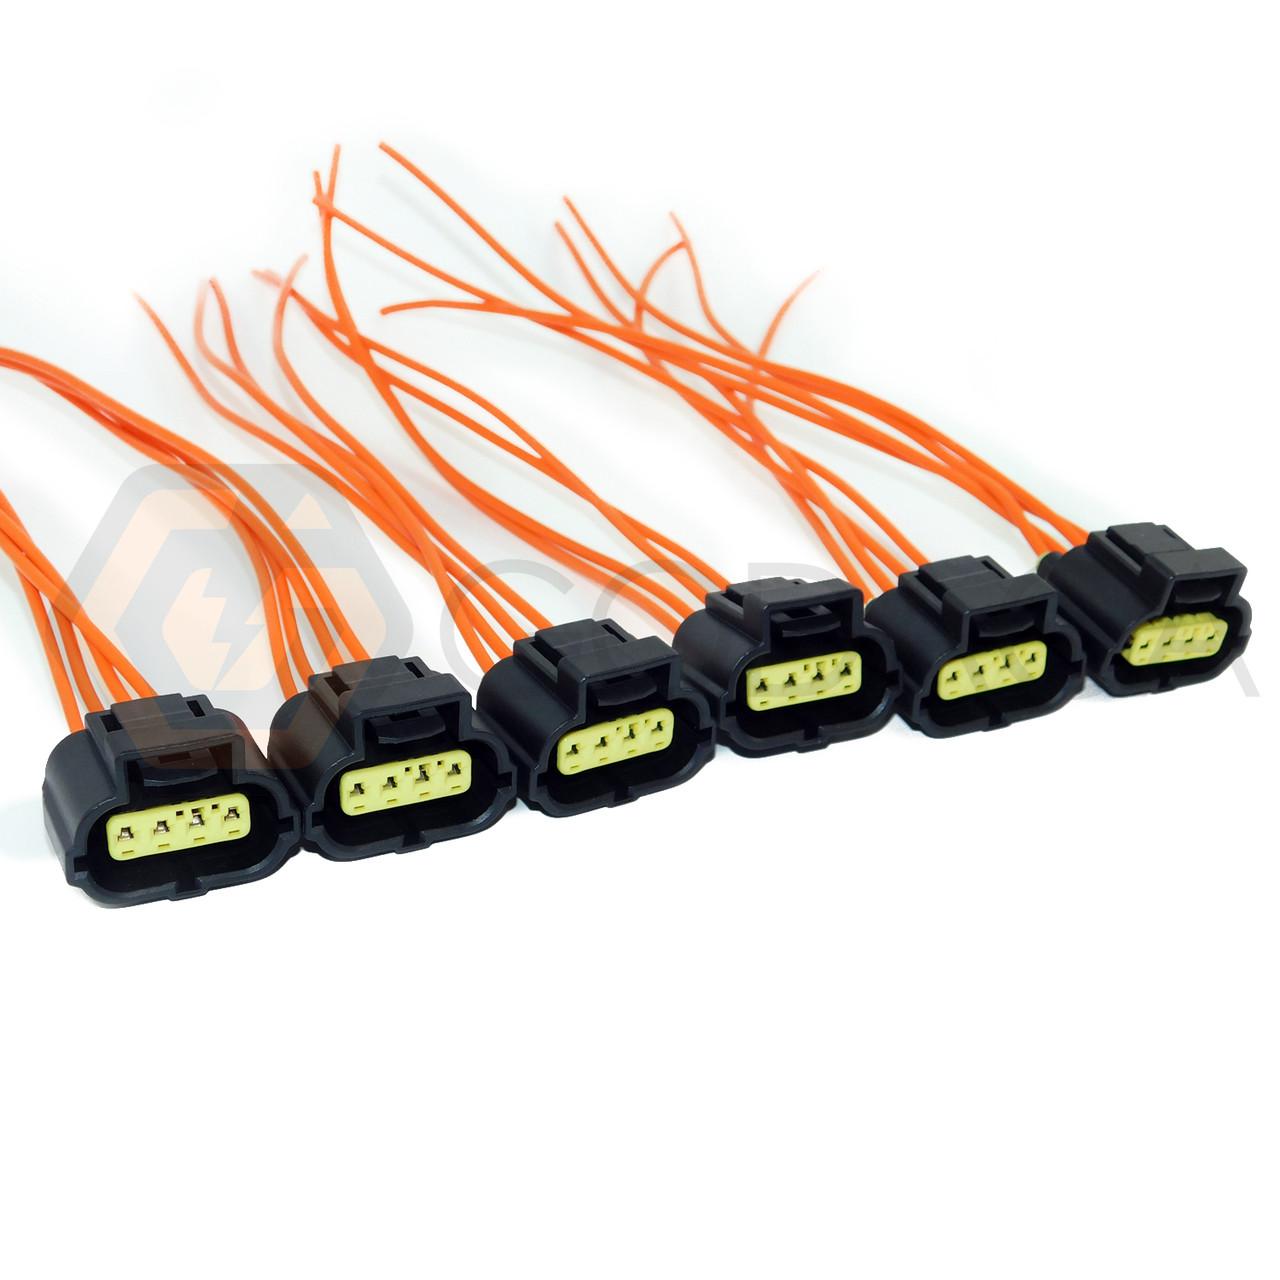 6x 4 Way Pintoyota Lexus Tps Throttle Repair Connector Pigtail Accelerator Pedal Position Sensor 90980 10711